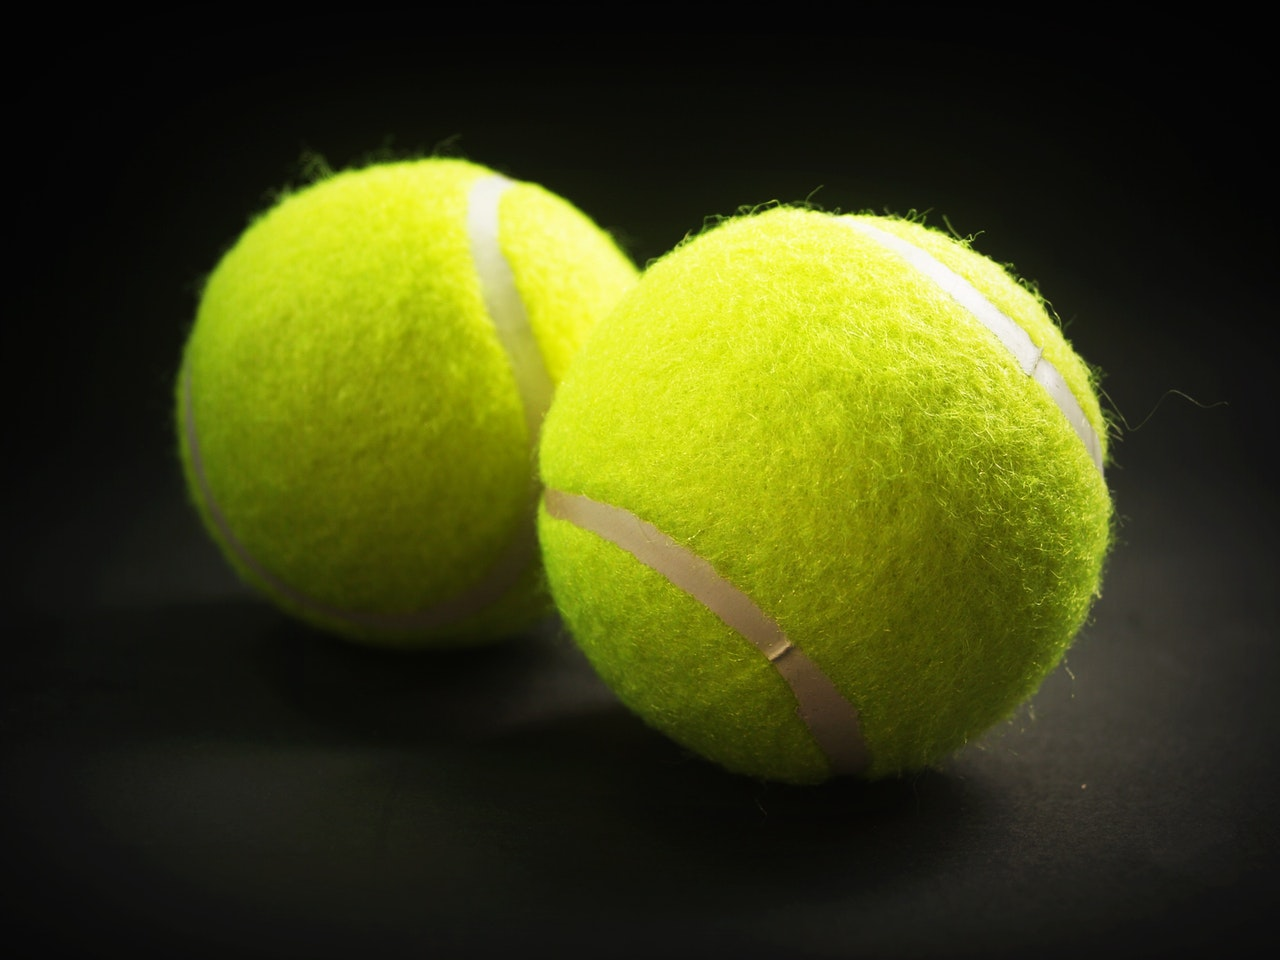 Tennis Balls on black background